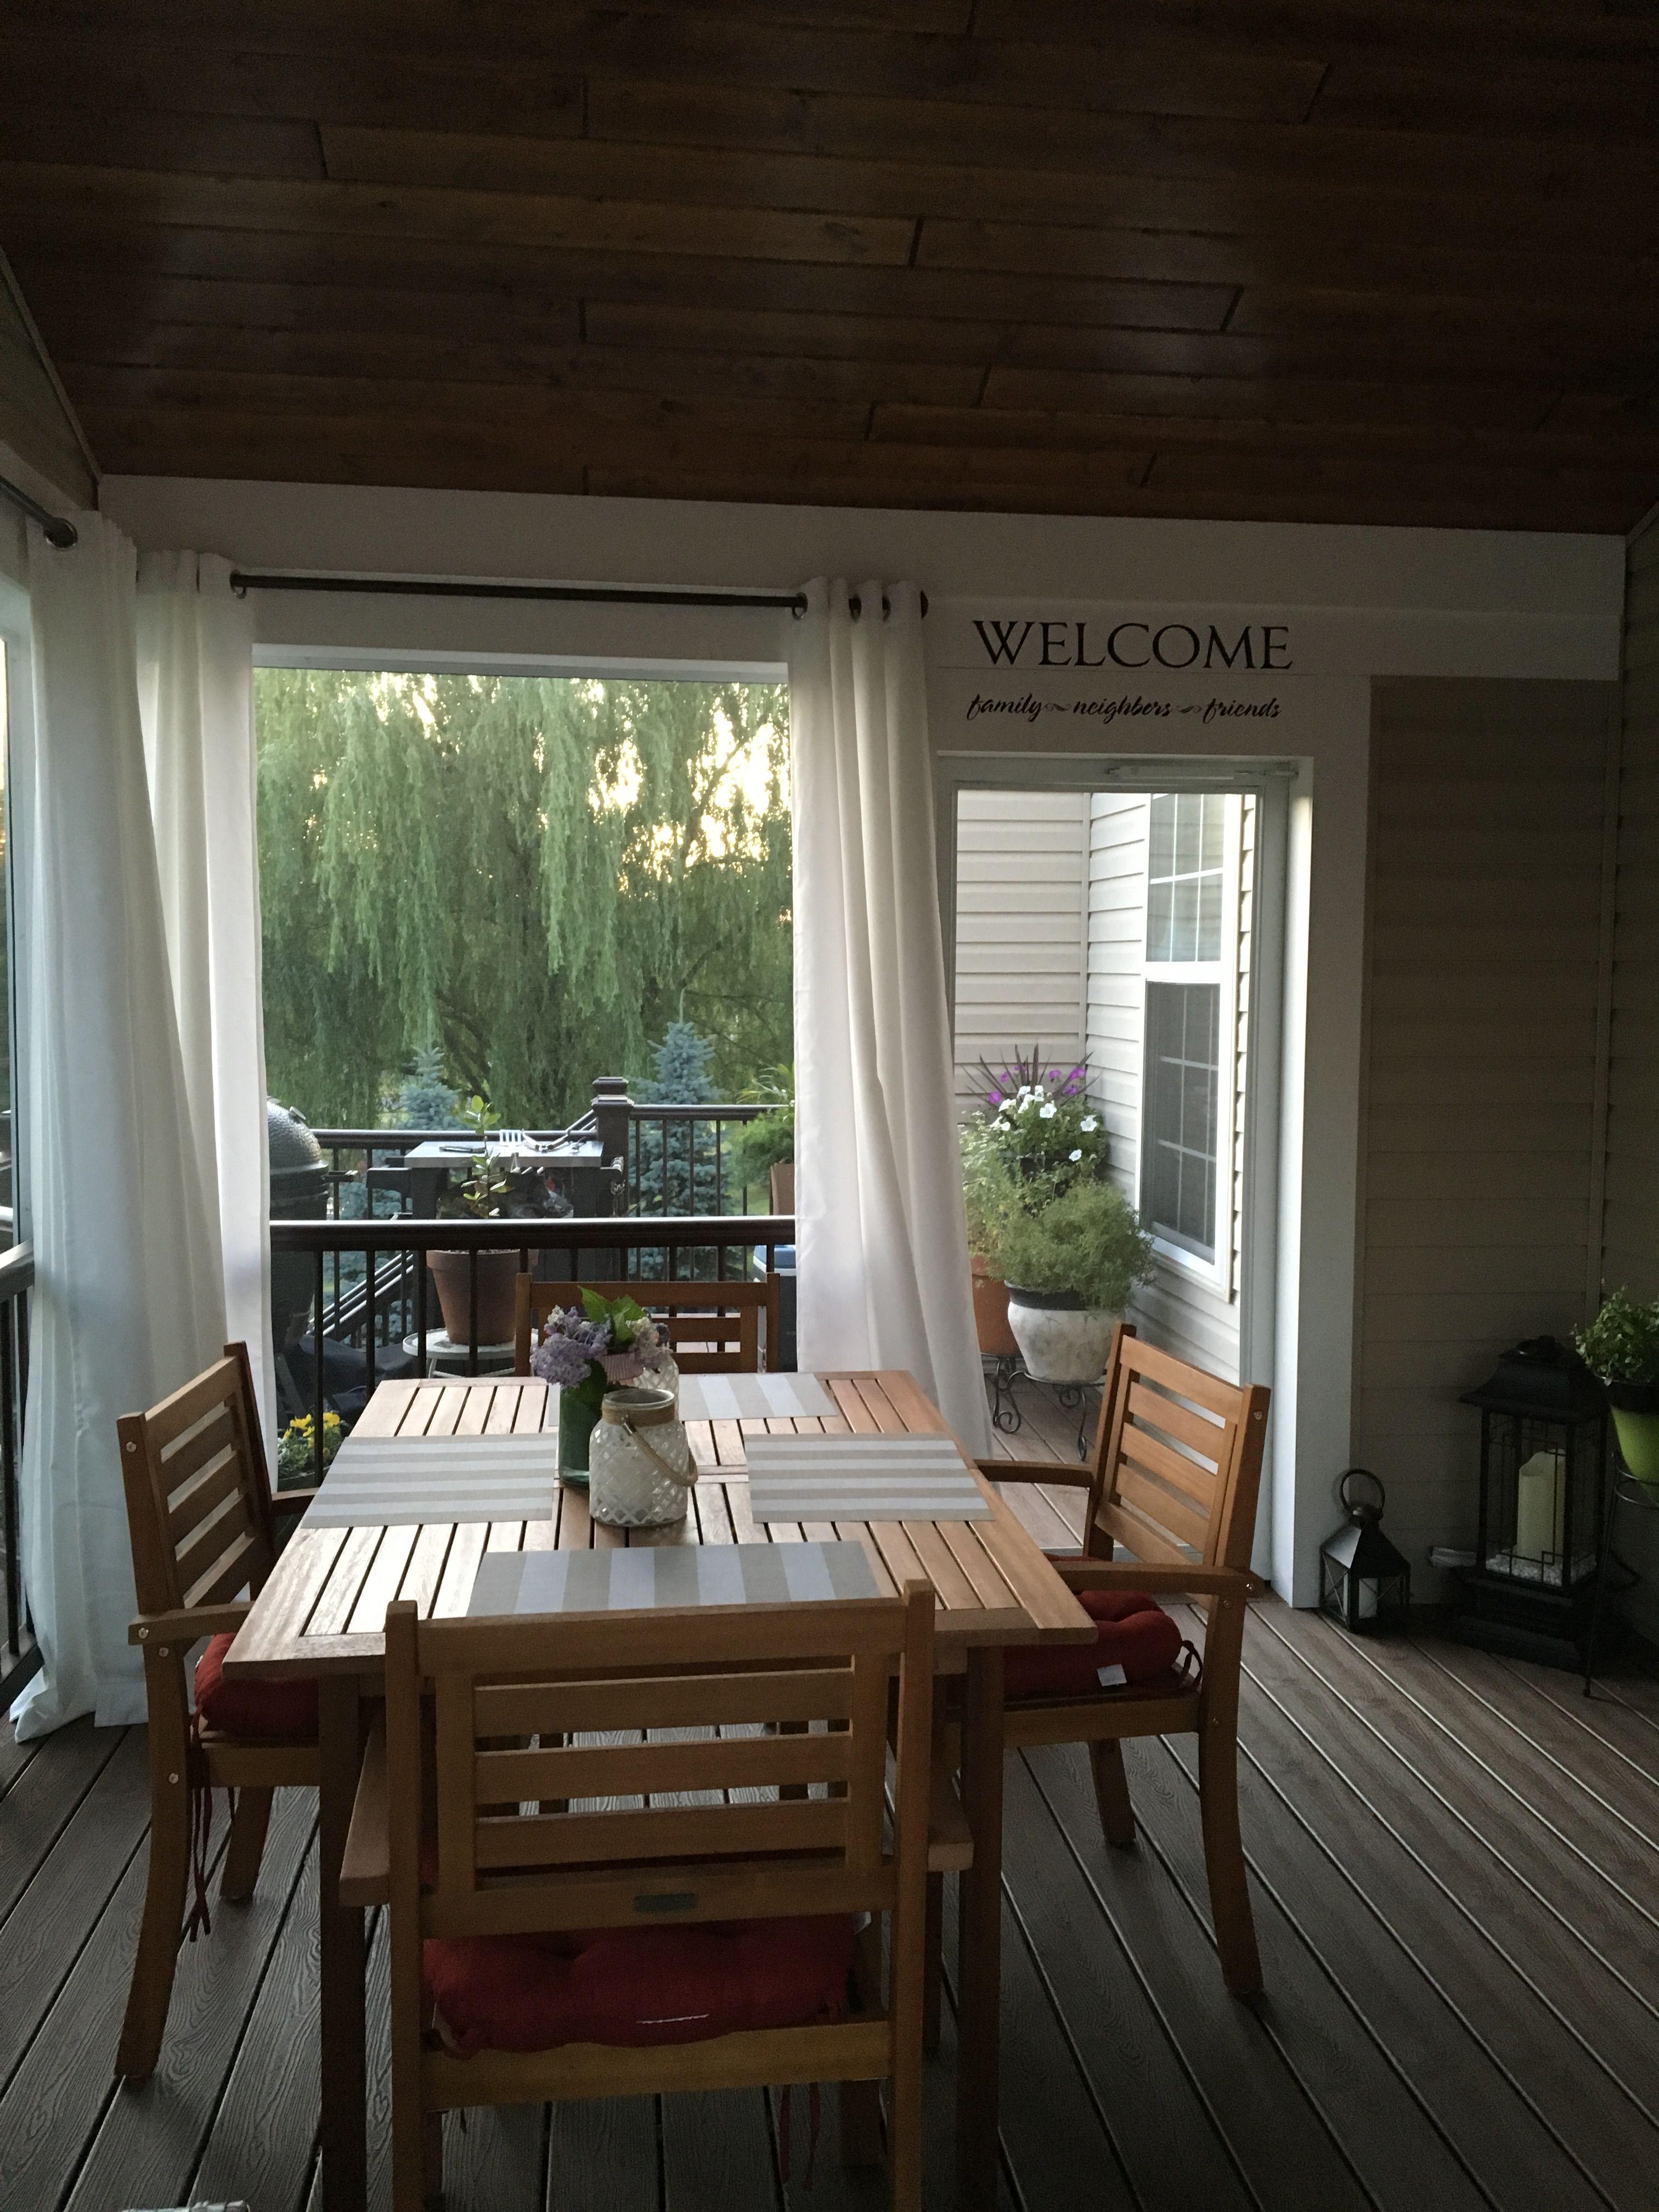 Screened in Deck | Patio deck designs, Add a room ... on Add On Patio Ideas id=40634